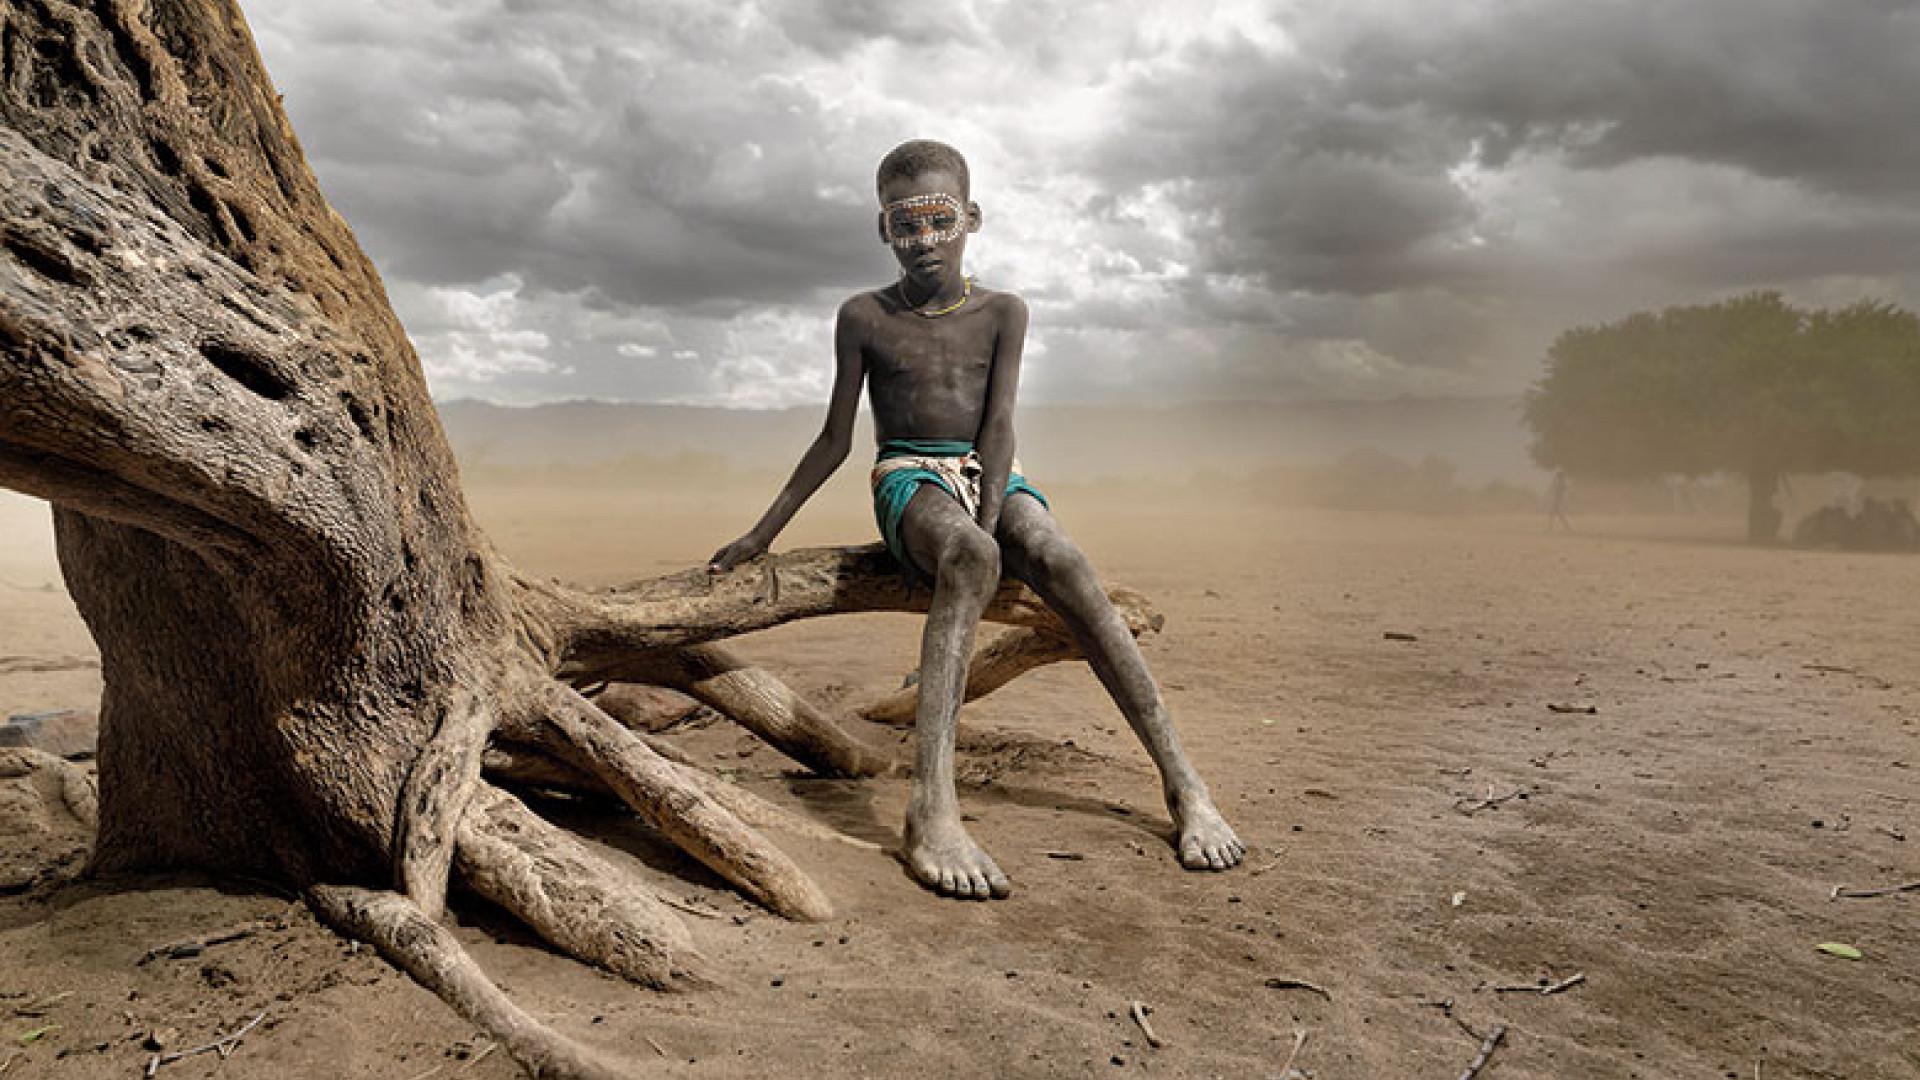 Carlos_Duarte,_Spain,_Entry,_Open_People,_2014_Sony_World_Photography_Awards.jpg_cmyk